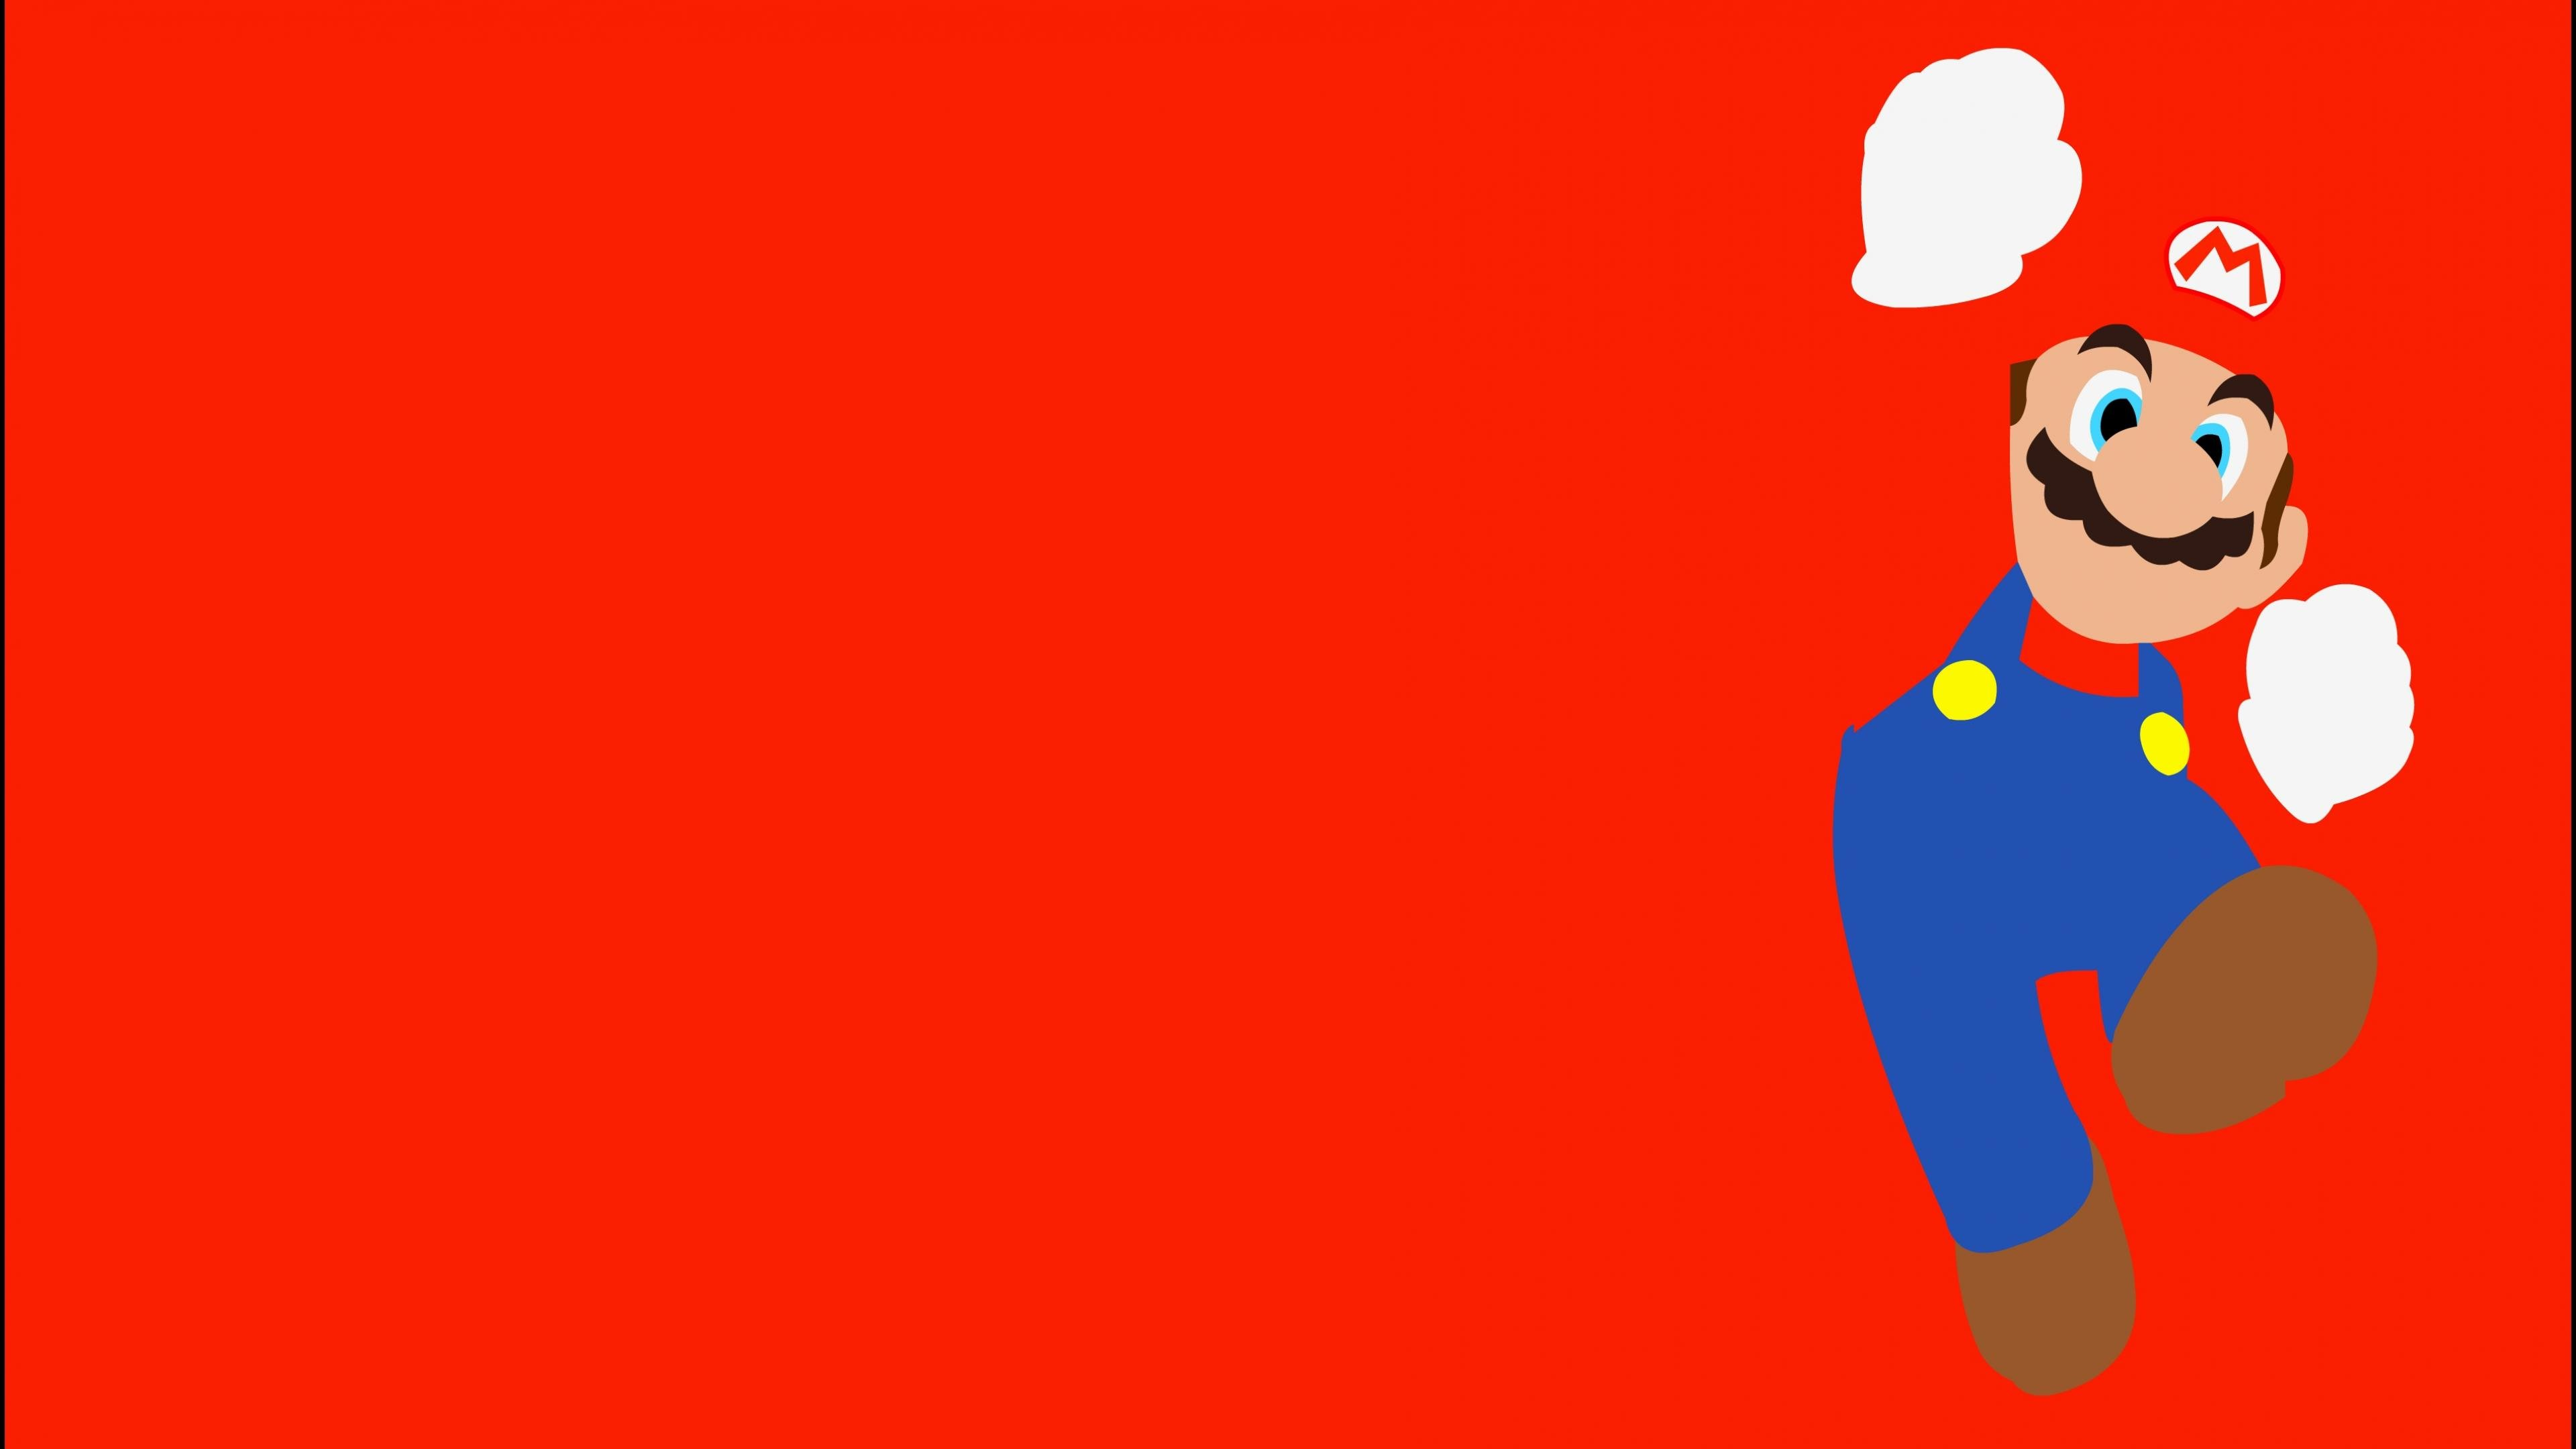 Mario Wallpapers 3840x2160 Ultra Hd 4k Desktop Backgrounds